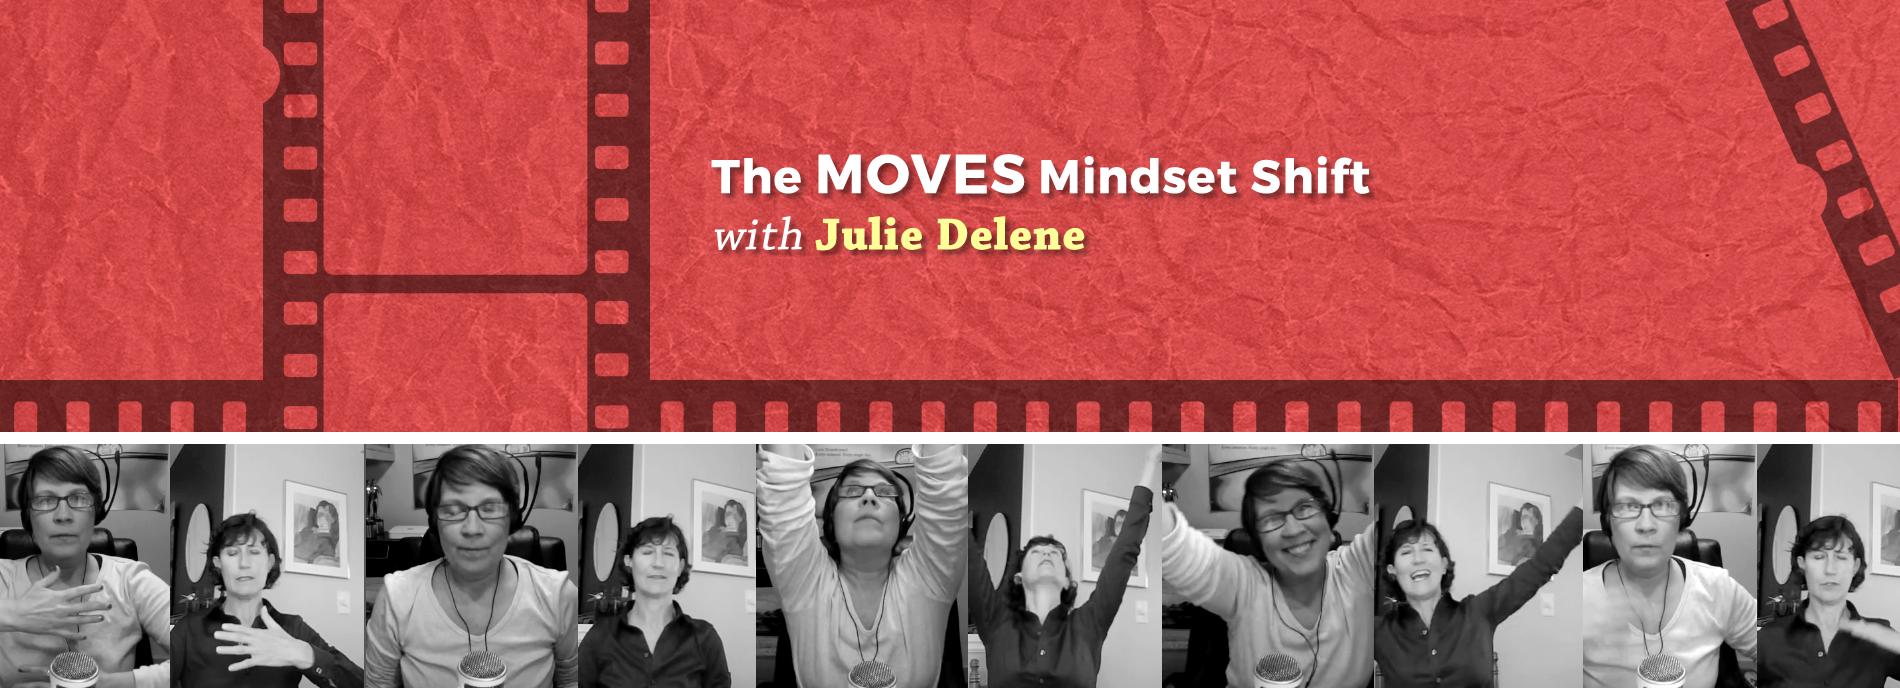 1900 x 700 Moves with Julie Delene